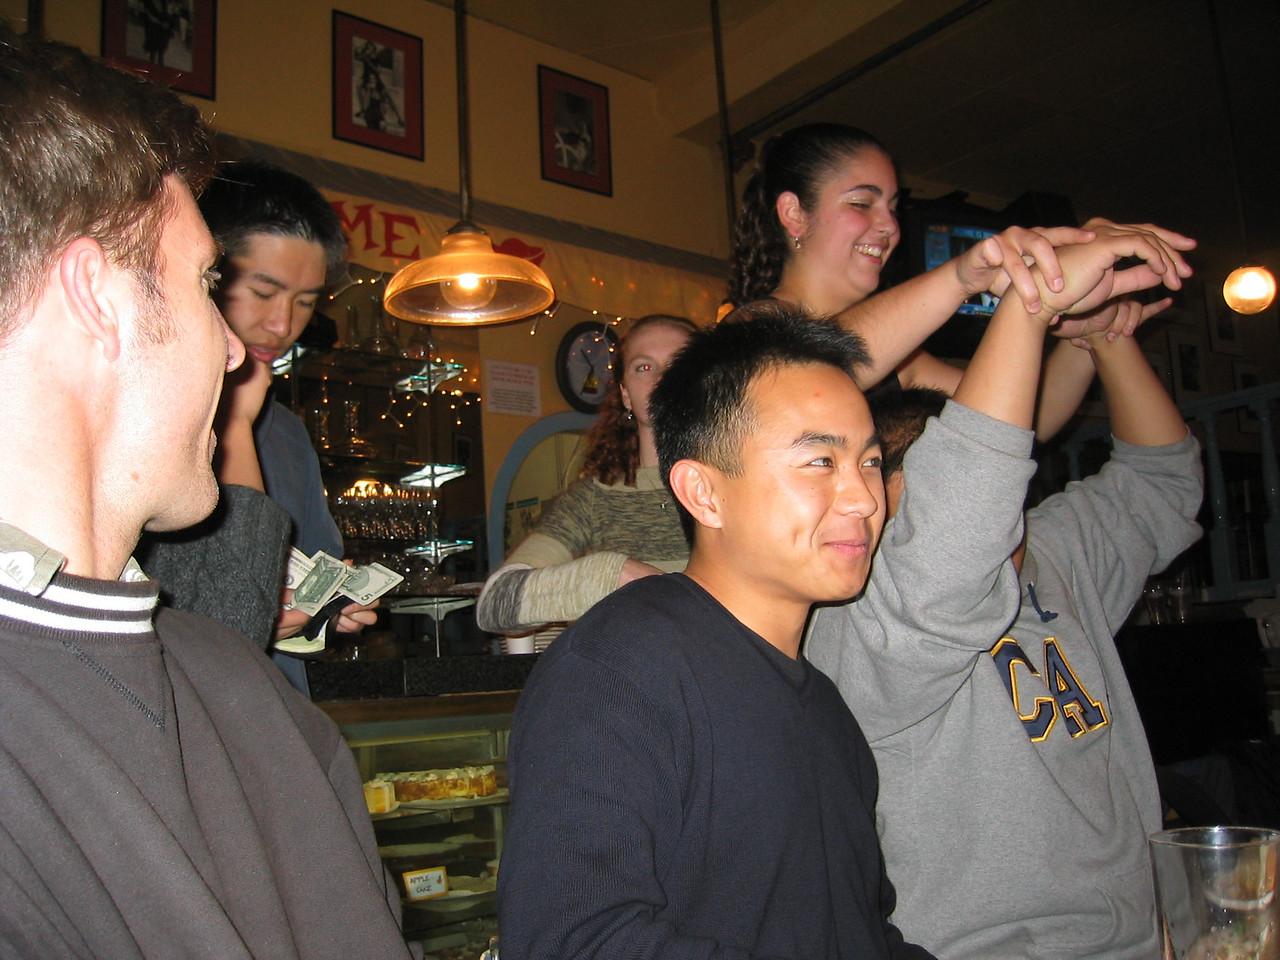 2003 - Steve Childs, Howard Zhao, Sarah Lash, Sterling Tai, Stella Abad, & Anthony Kong